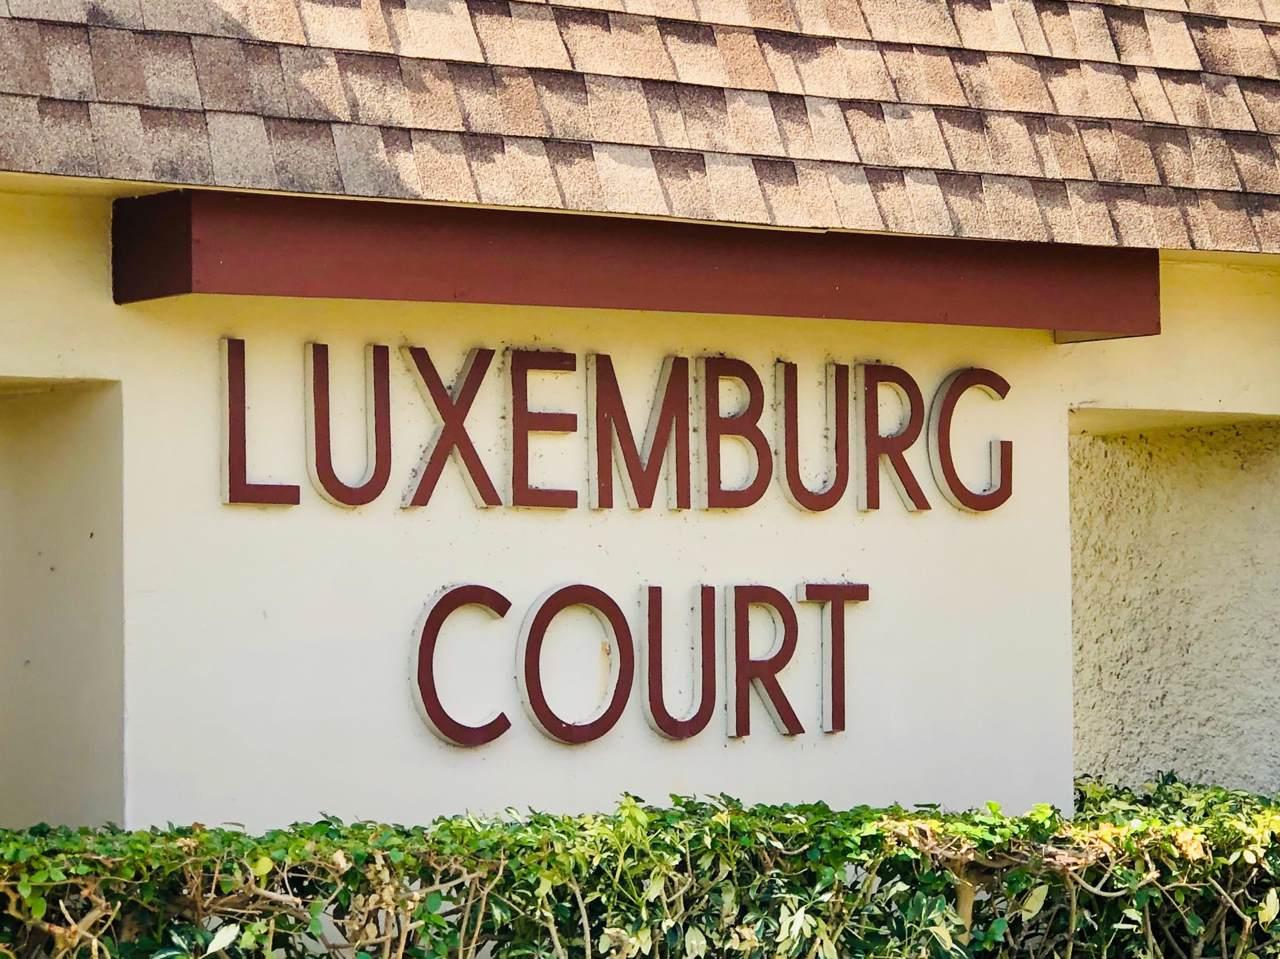 4483 Luxemburg Court - Photo 1